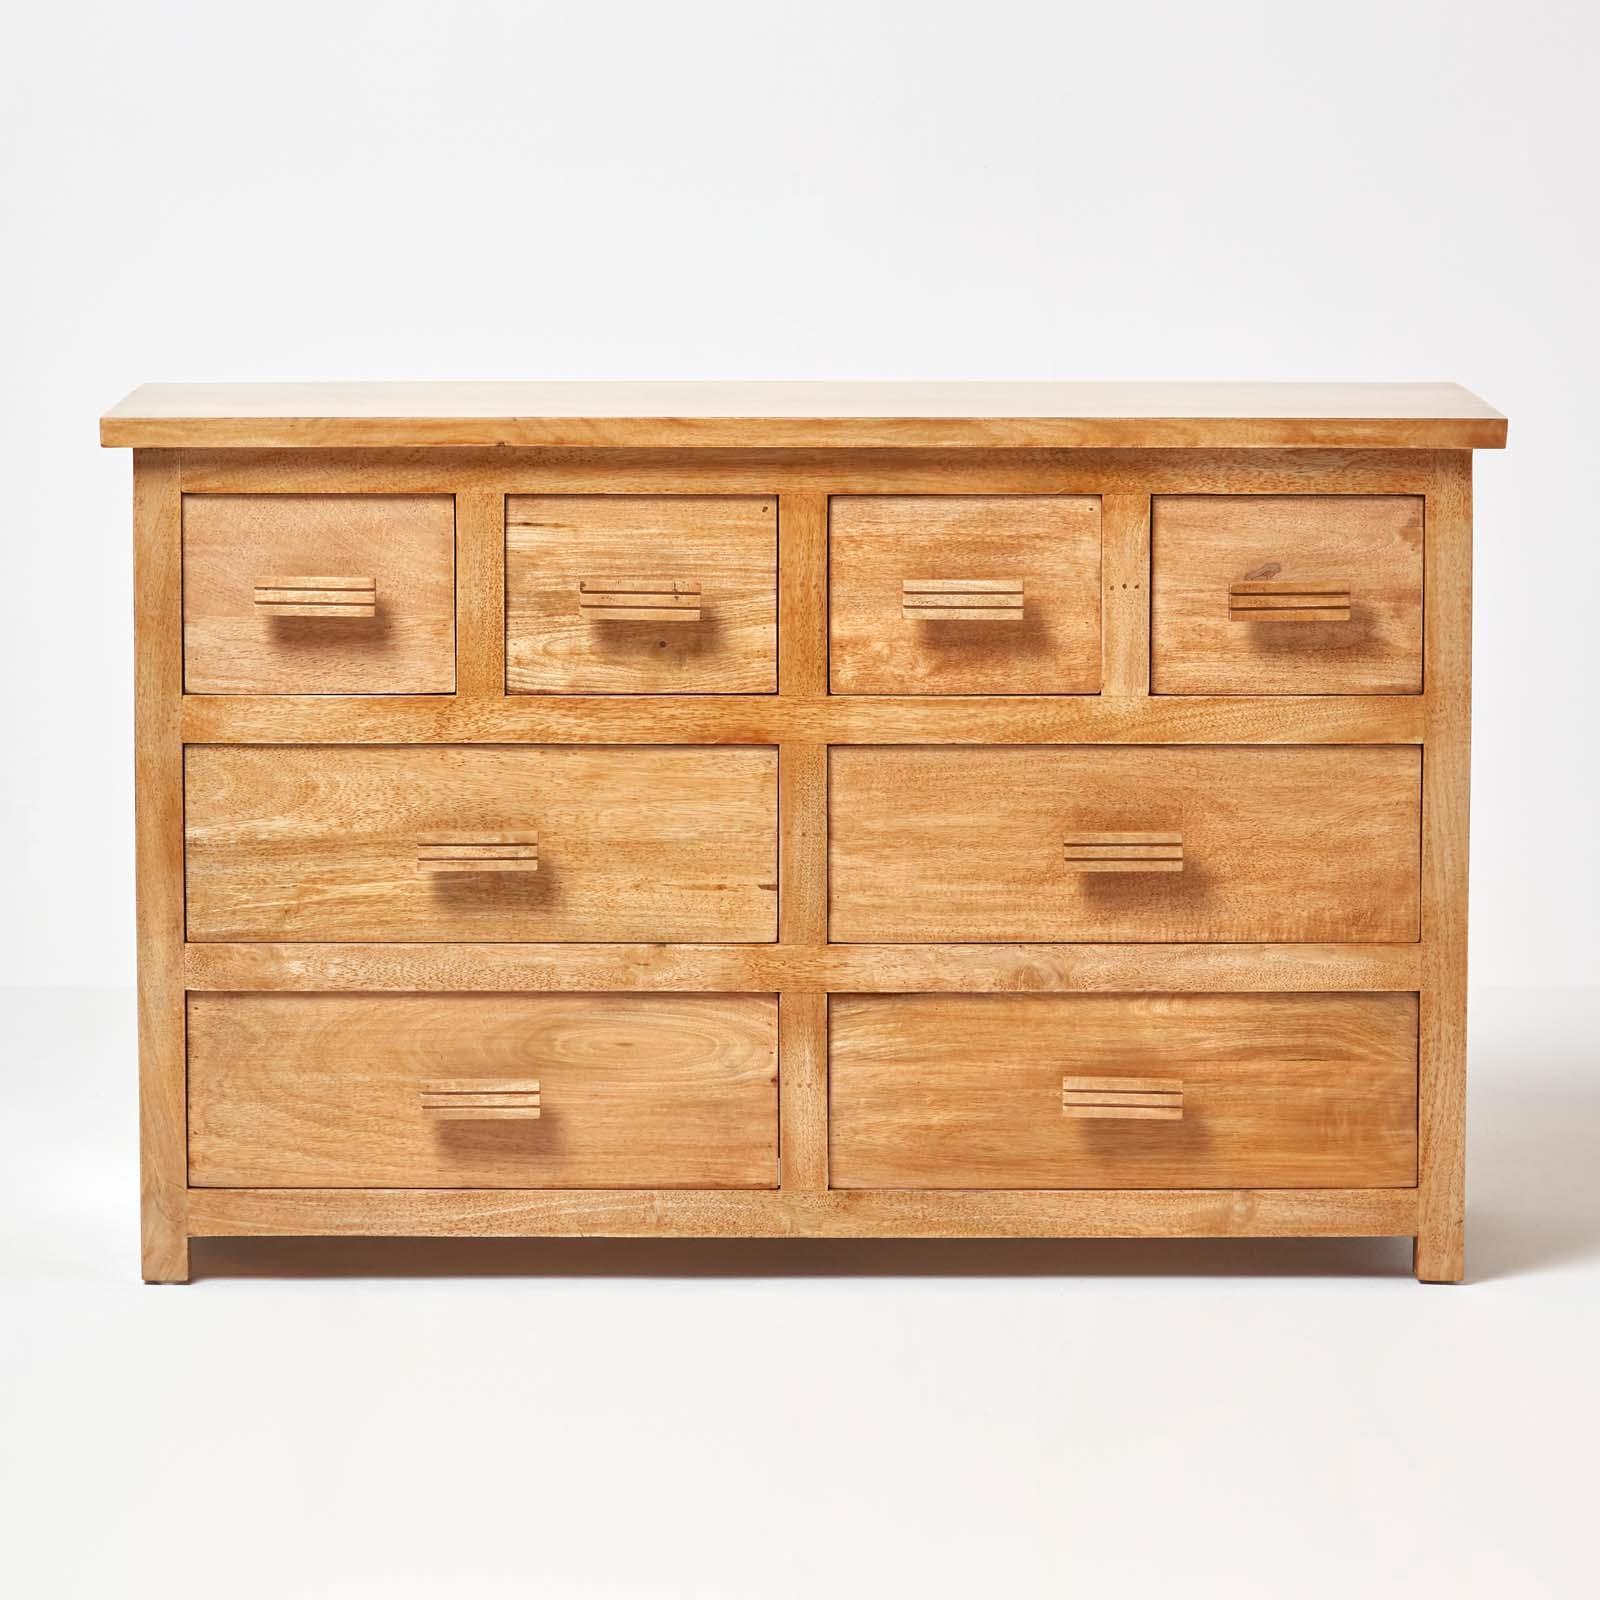 san francisco de94f 9e766 Details about Mangat Wooden Chest of Drawers in Dark wood/Oak Shade, Mango  wood Furniture